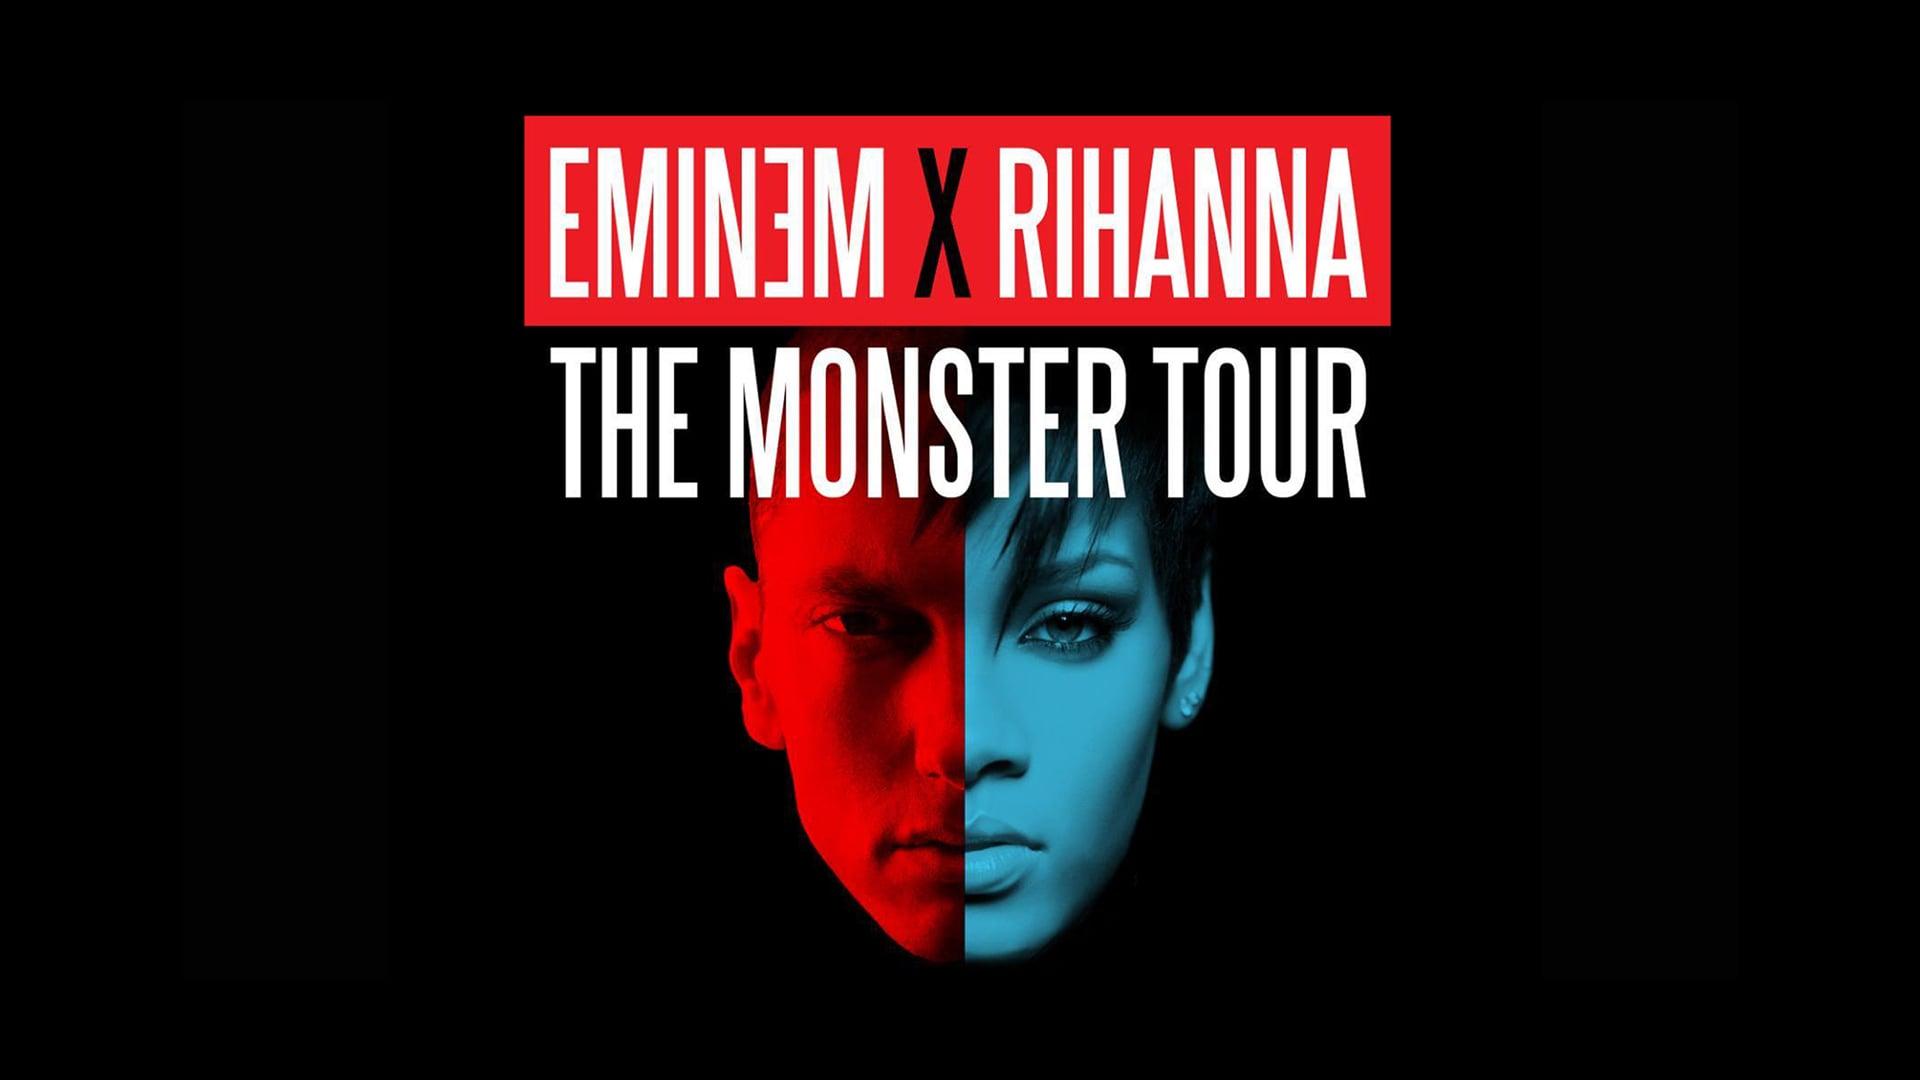 The Monster Tour - Eminem Visuals